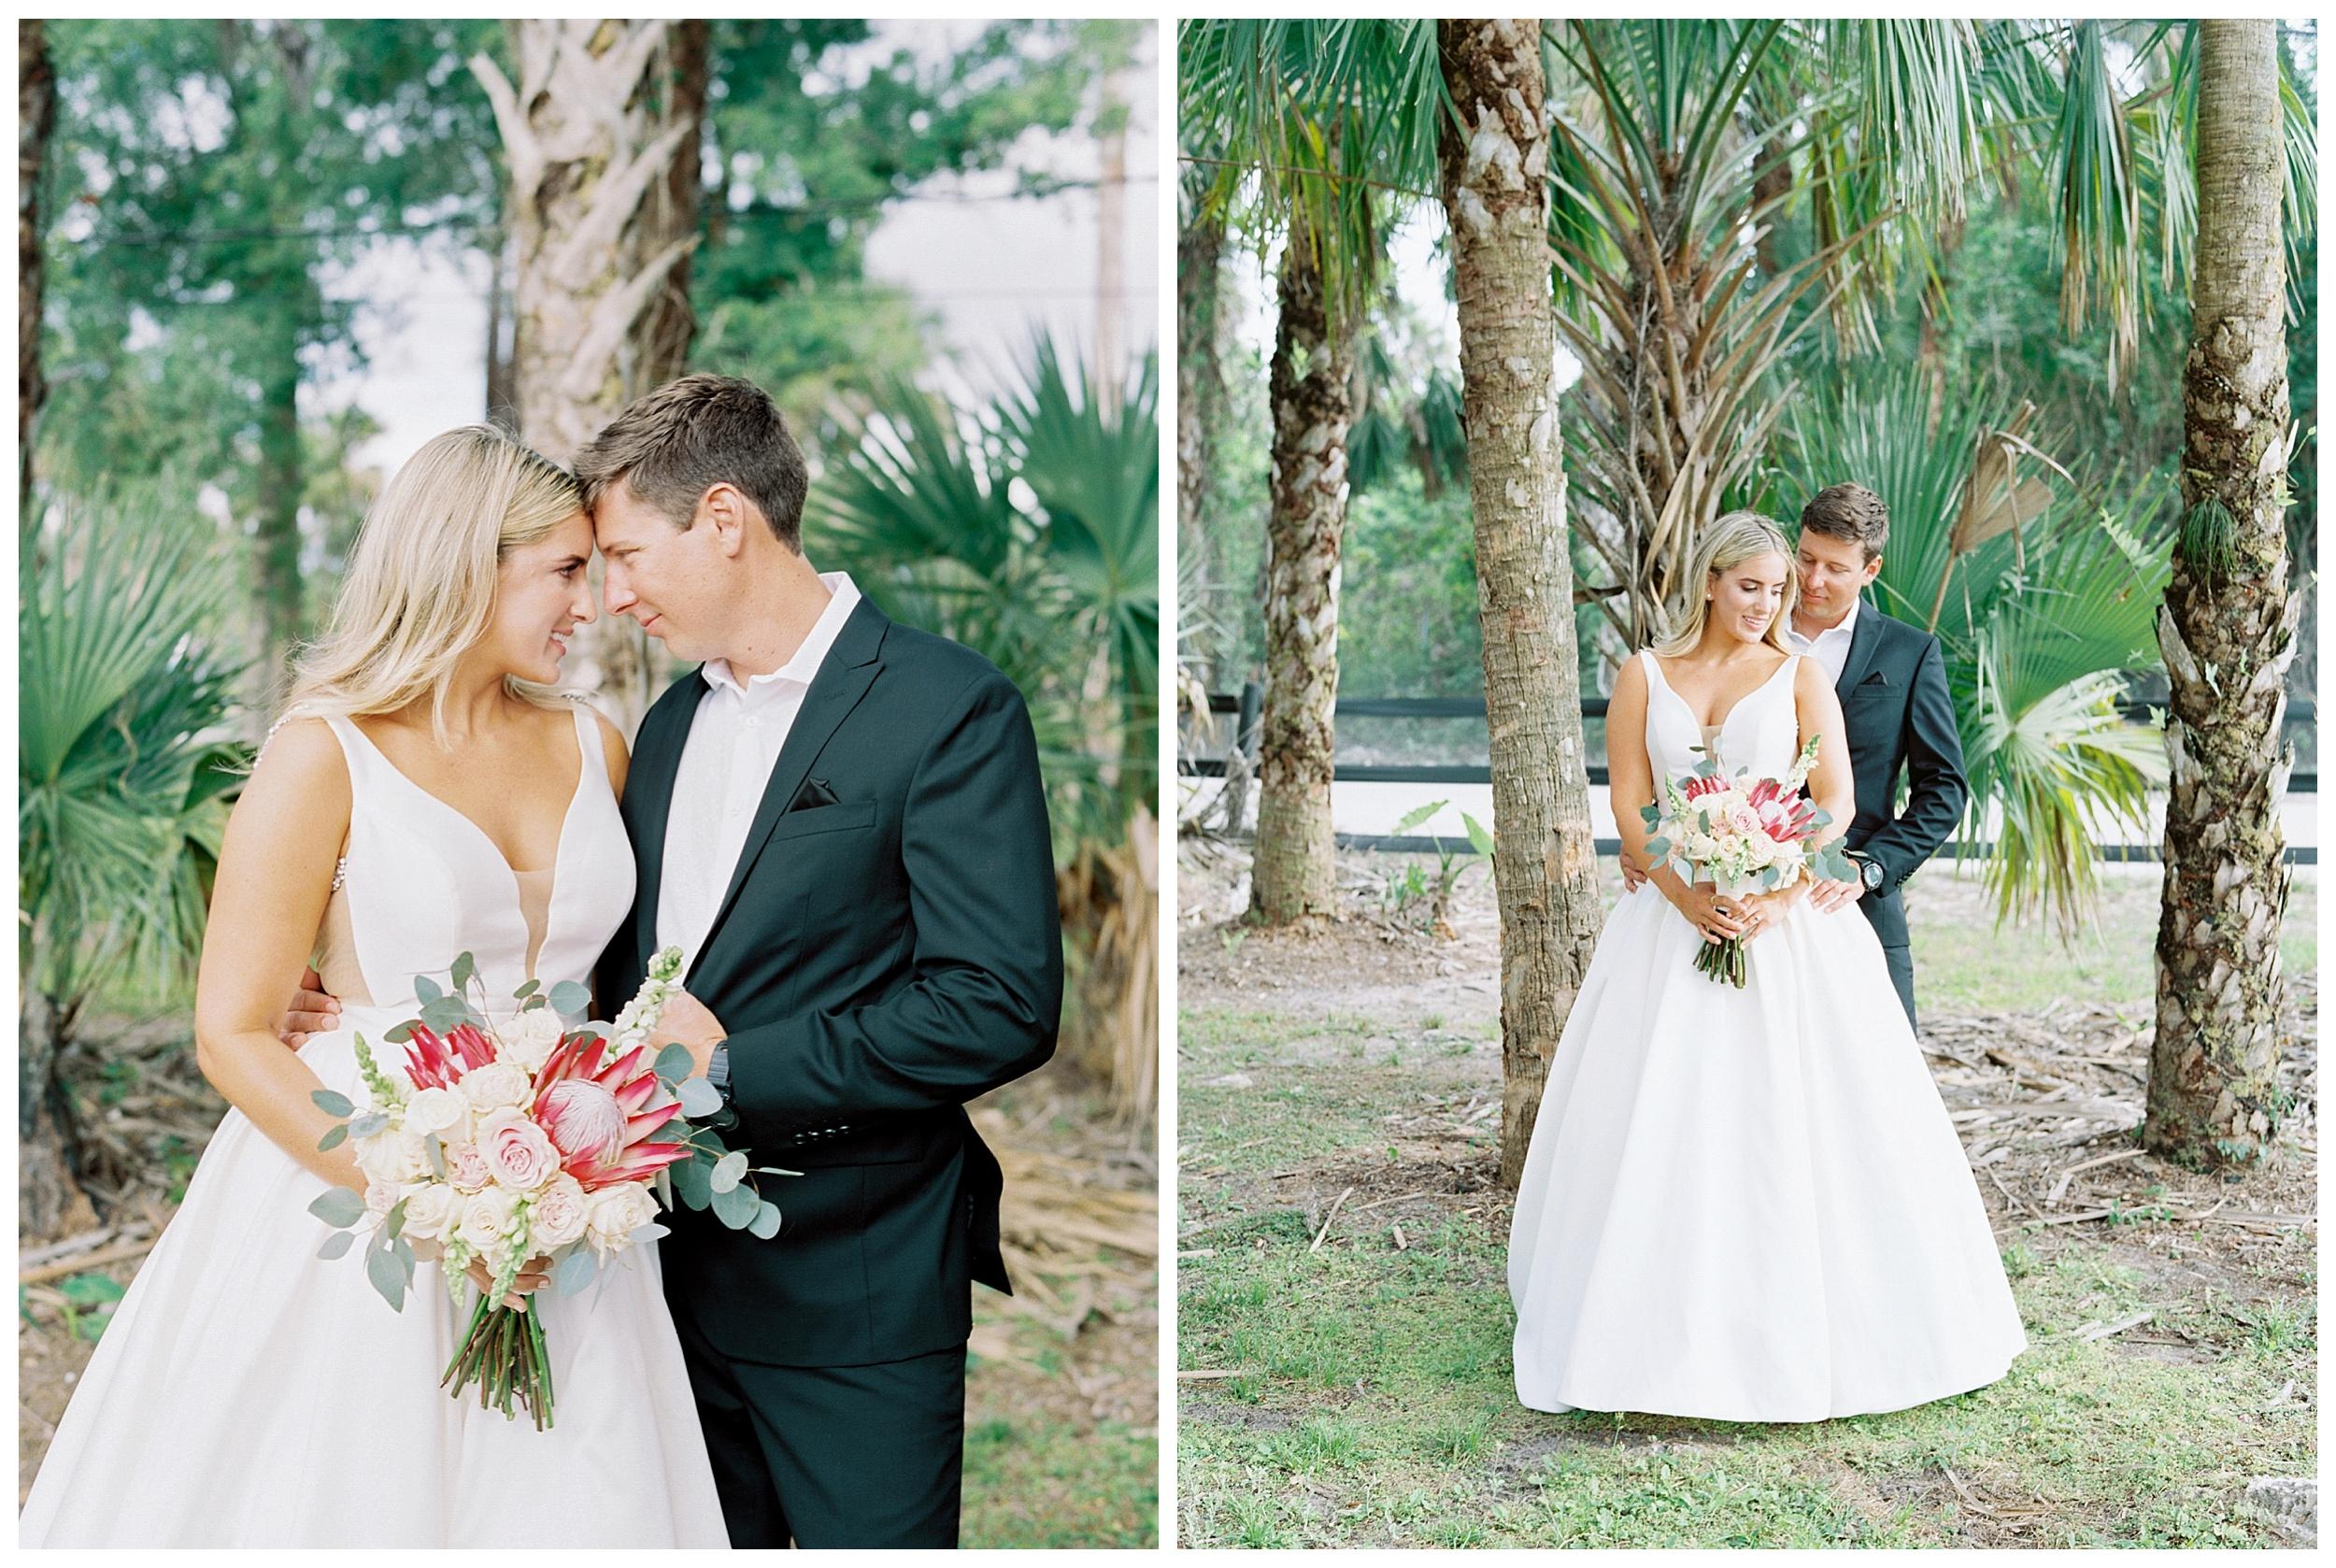 South Florida Wedding Photographer Kir Tuben_0047.jpg